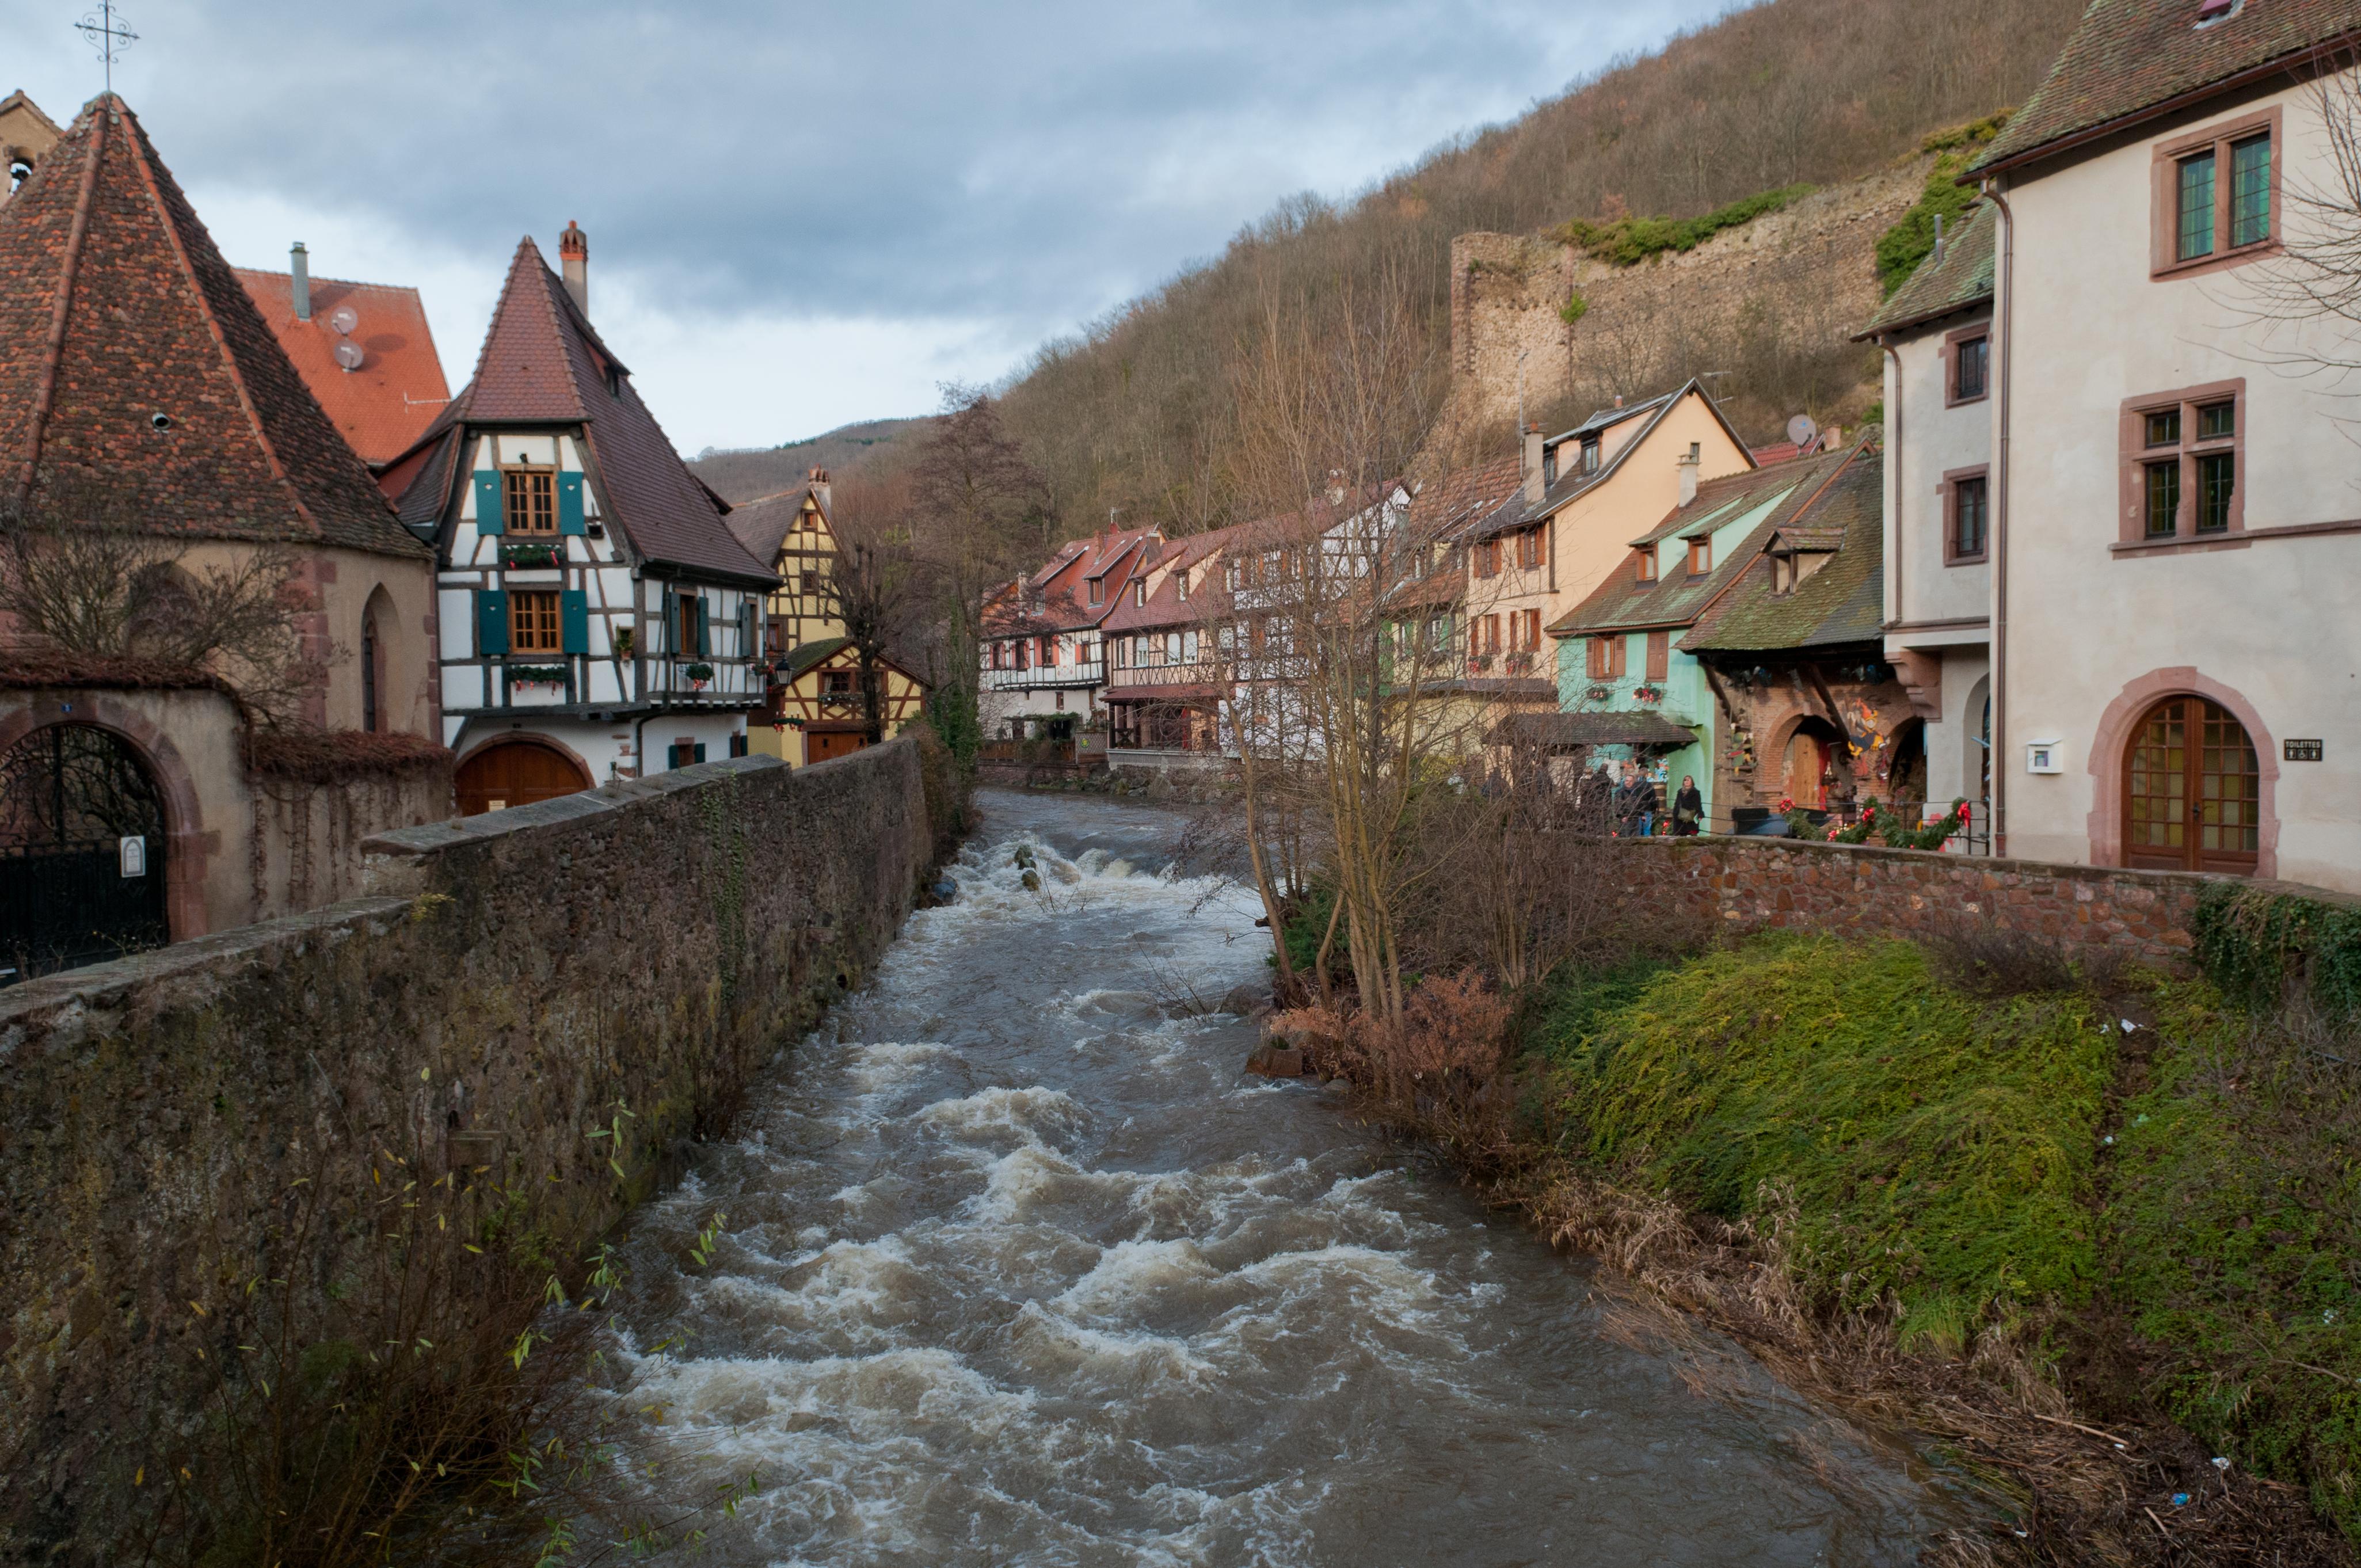 Traduction flirter allemand Dictionnaire franais-allemand Reverso